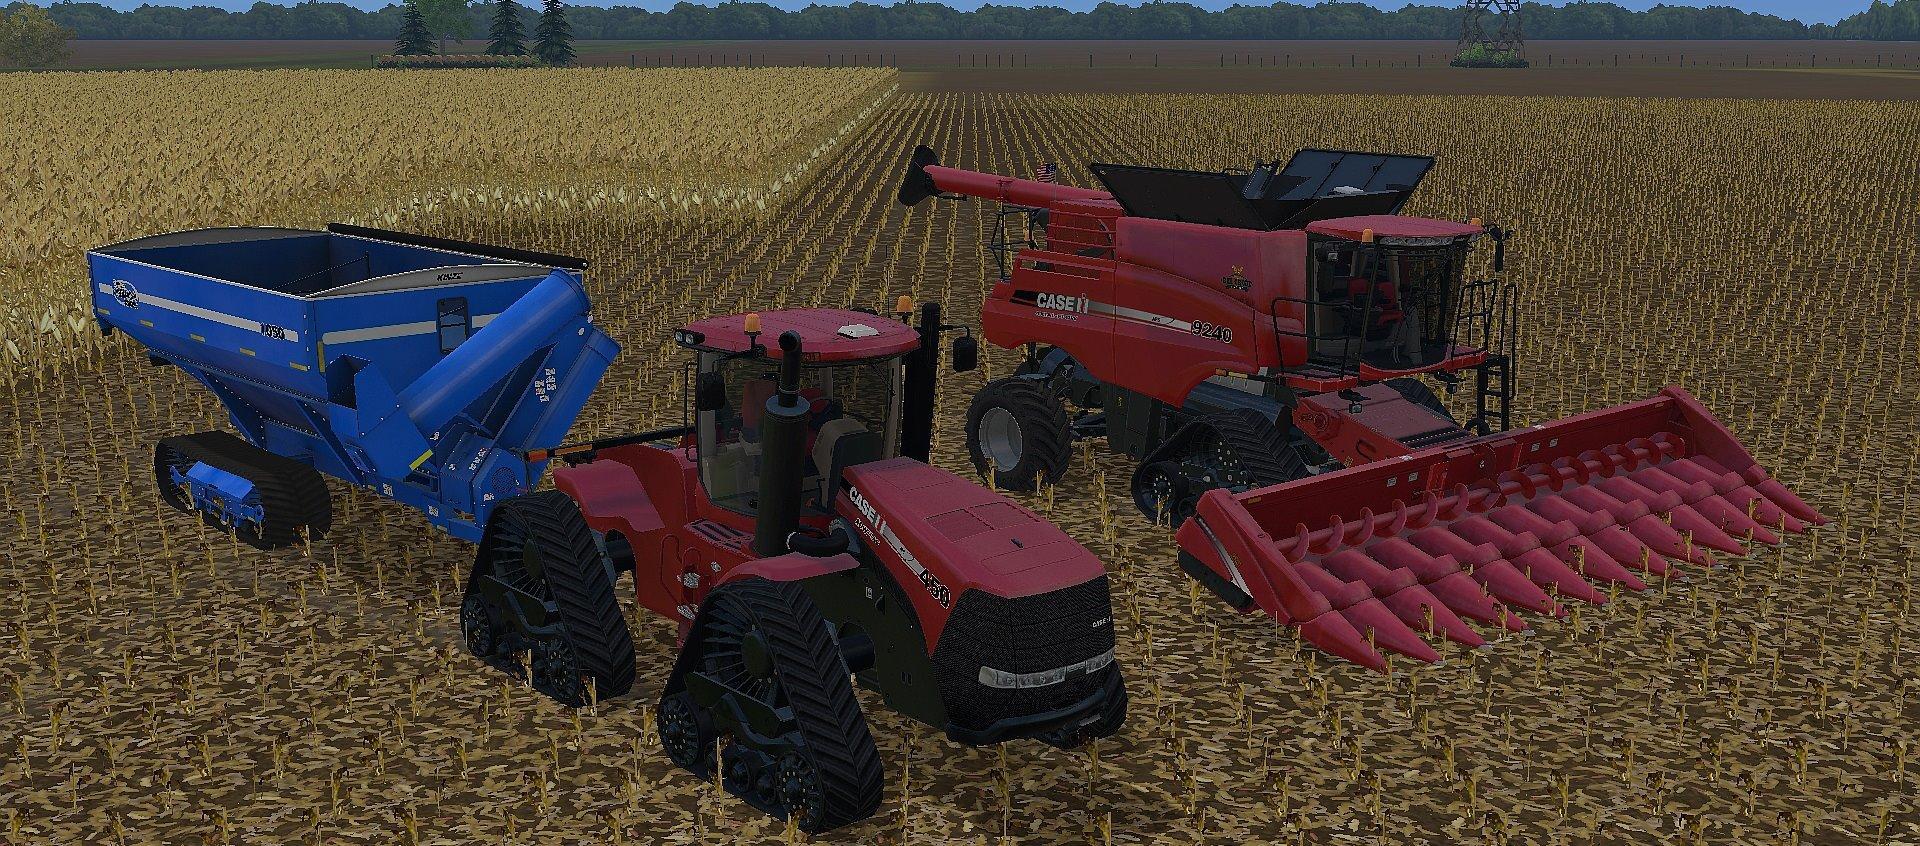 CASE IH COMBINES PACK V1 0 FS 2015 - Farming simulator 2019 / 2017